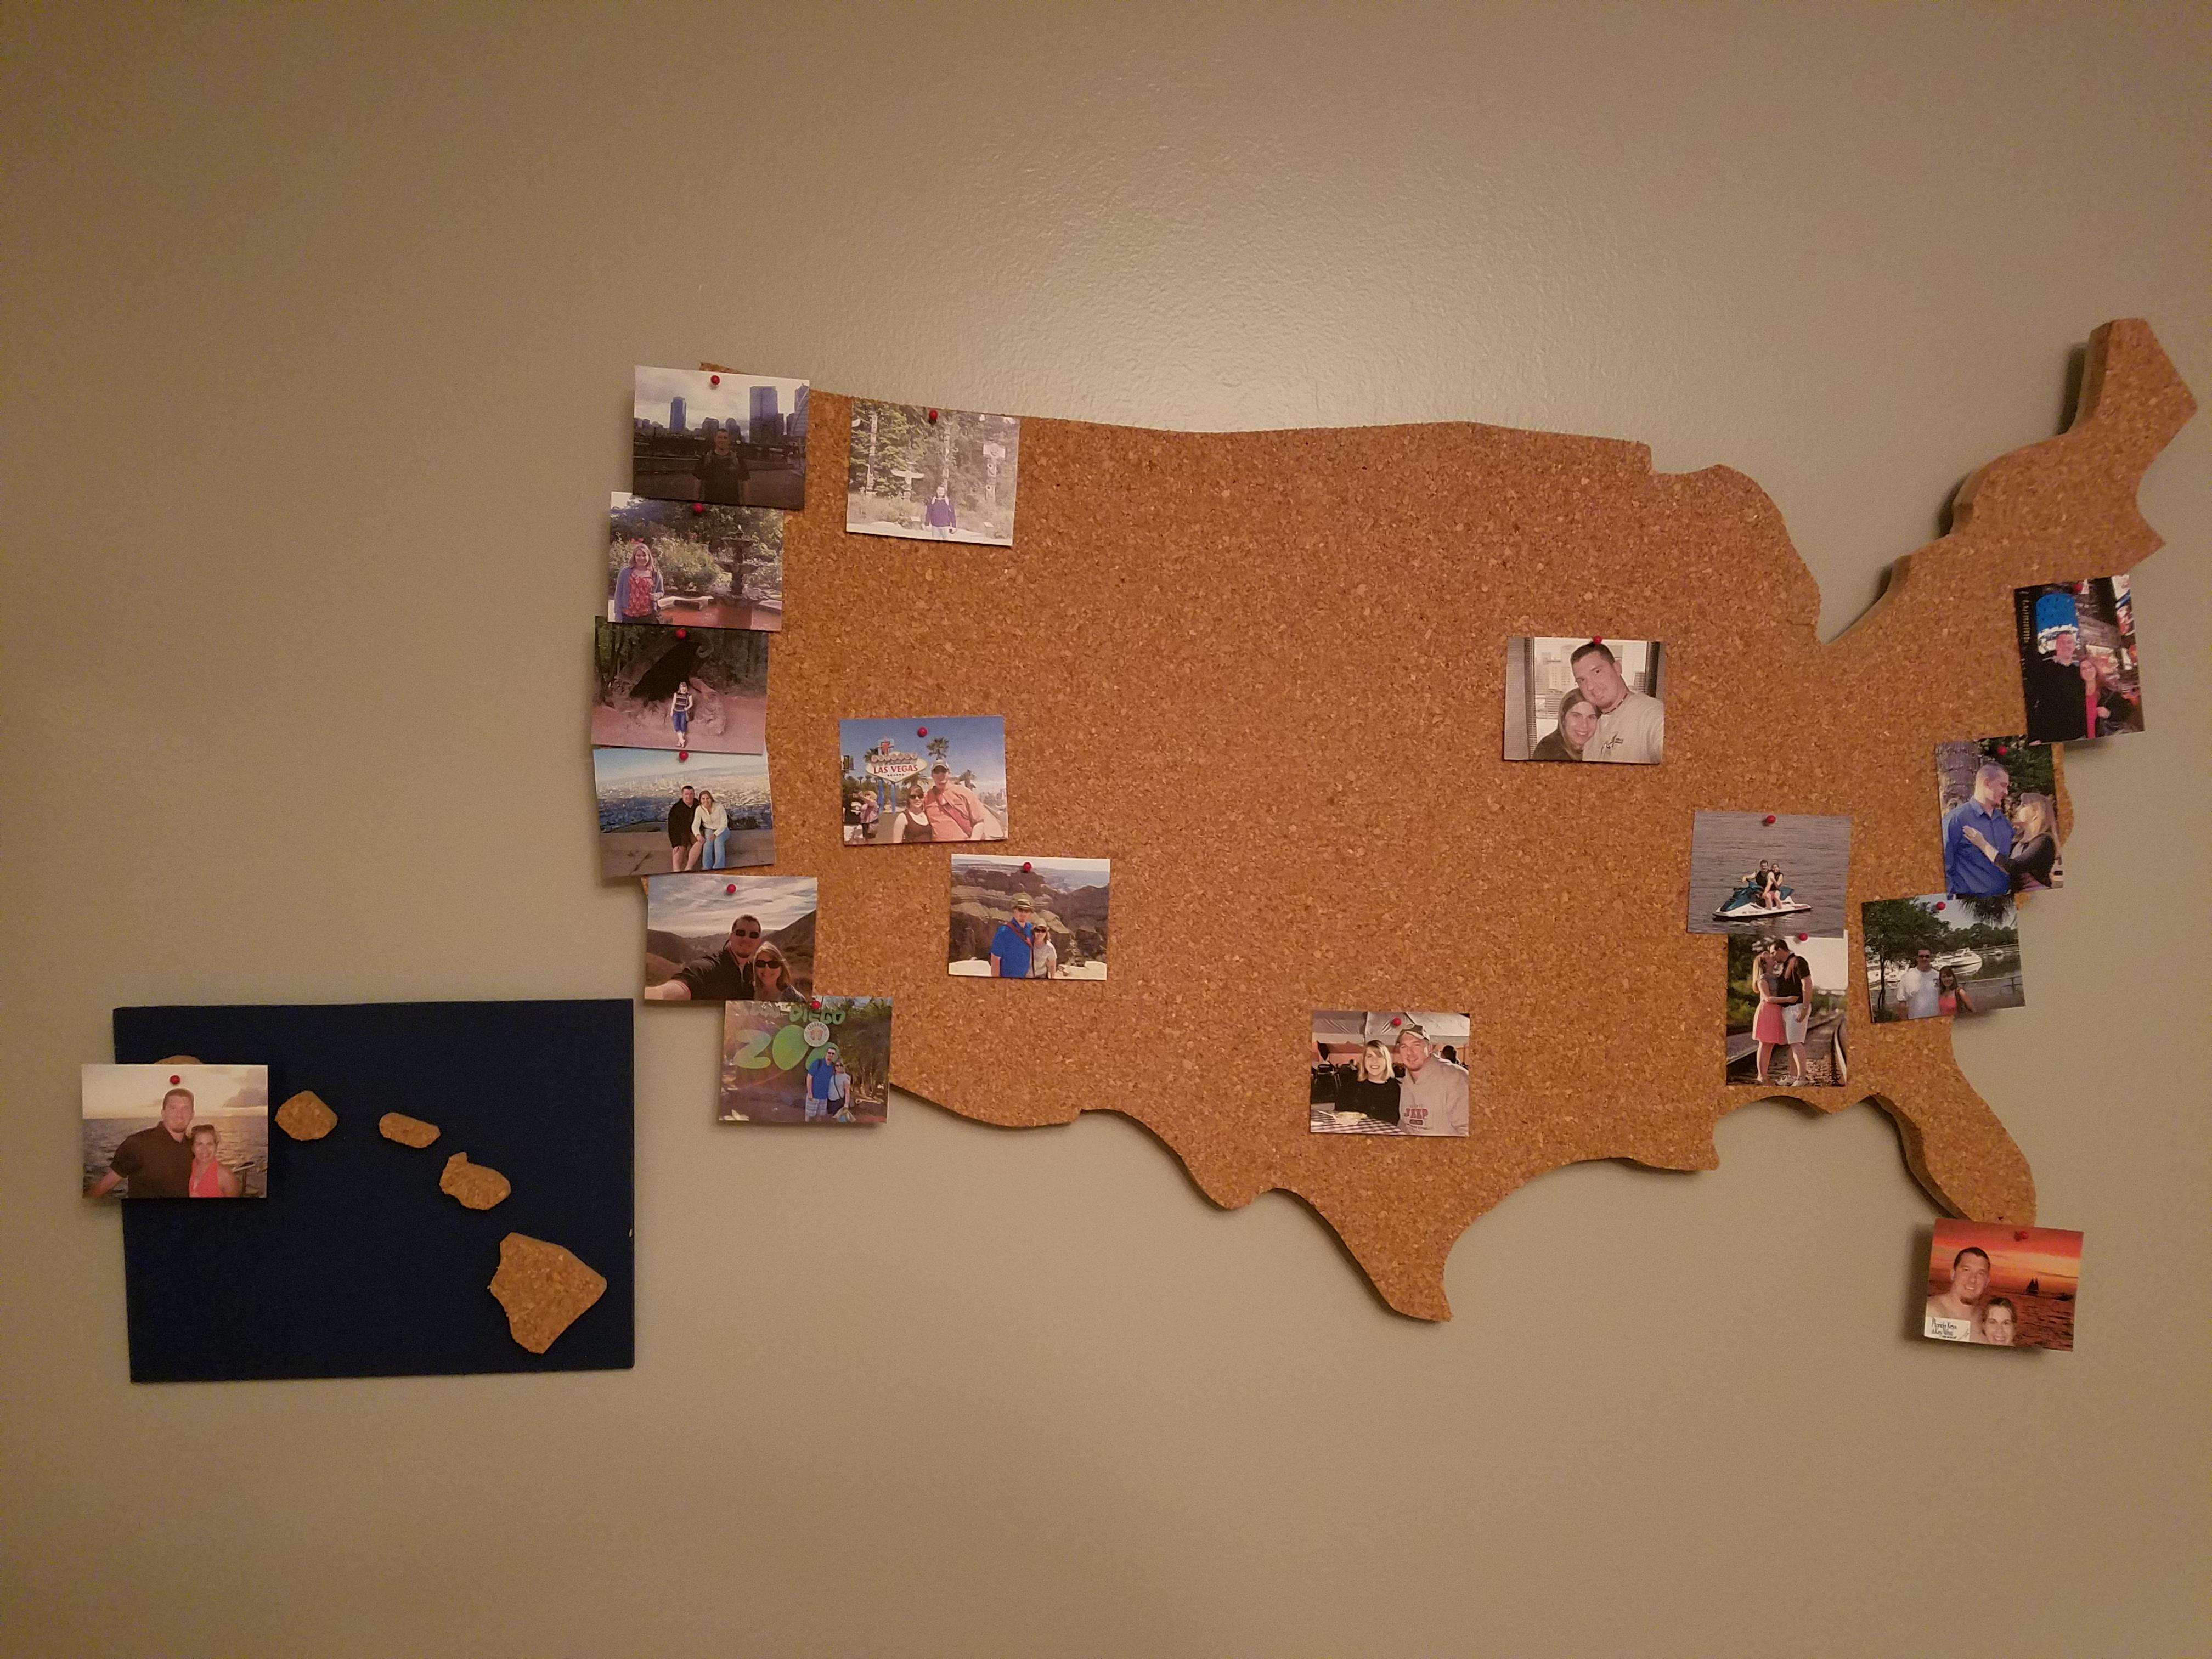 Diy Cork Board Map Of United States Piecesofapriljournalistblog